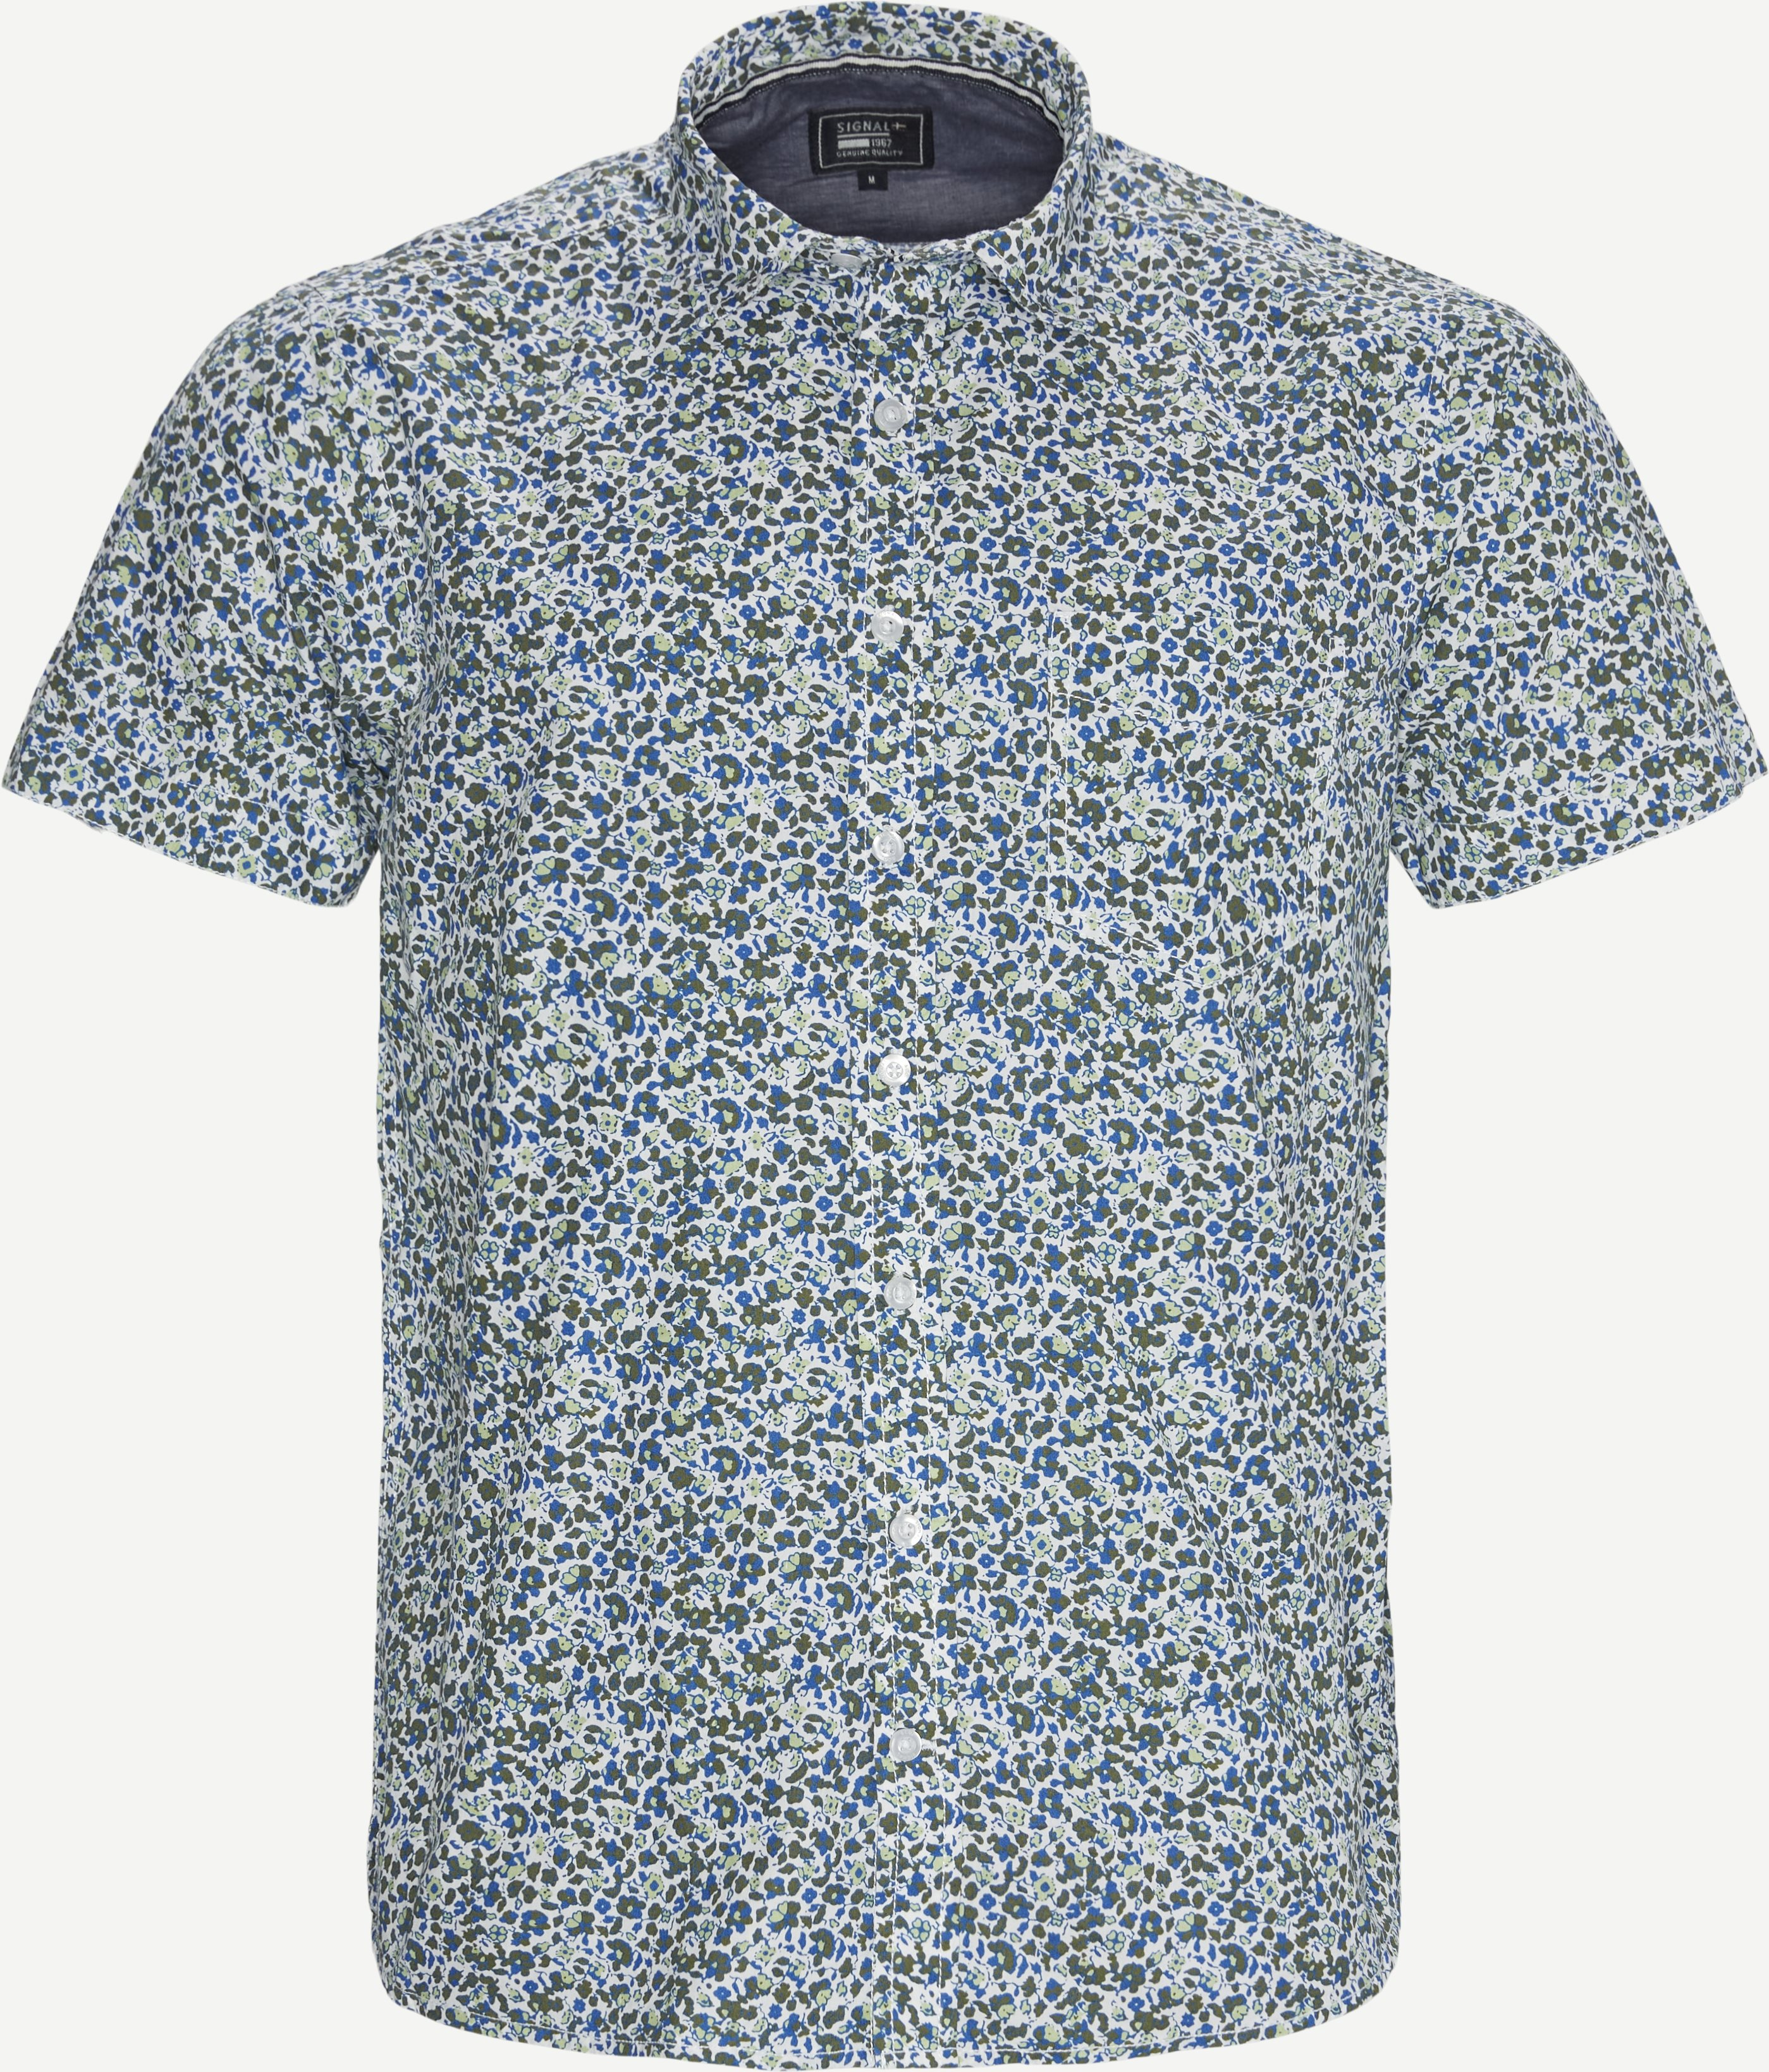 Kurzärmlige Hemden - Regular - Oliv